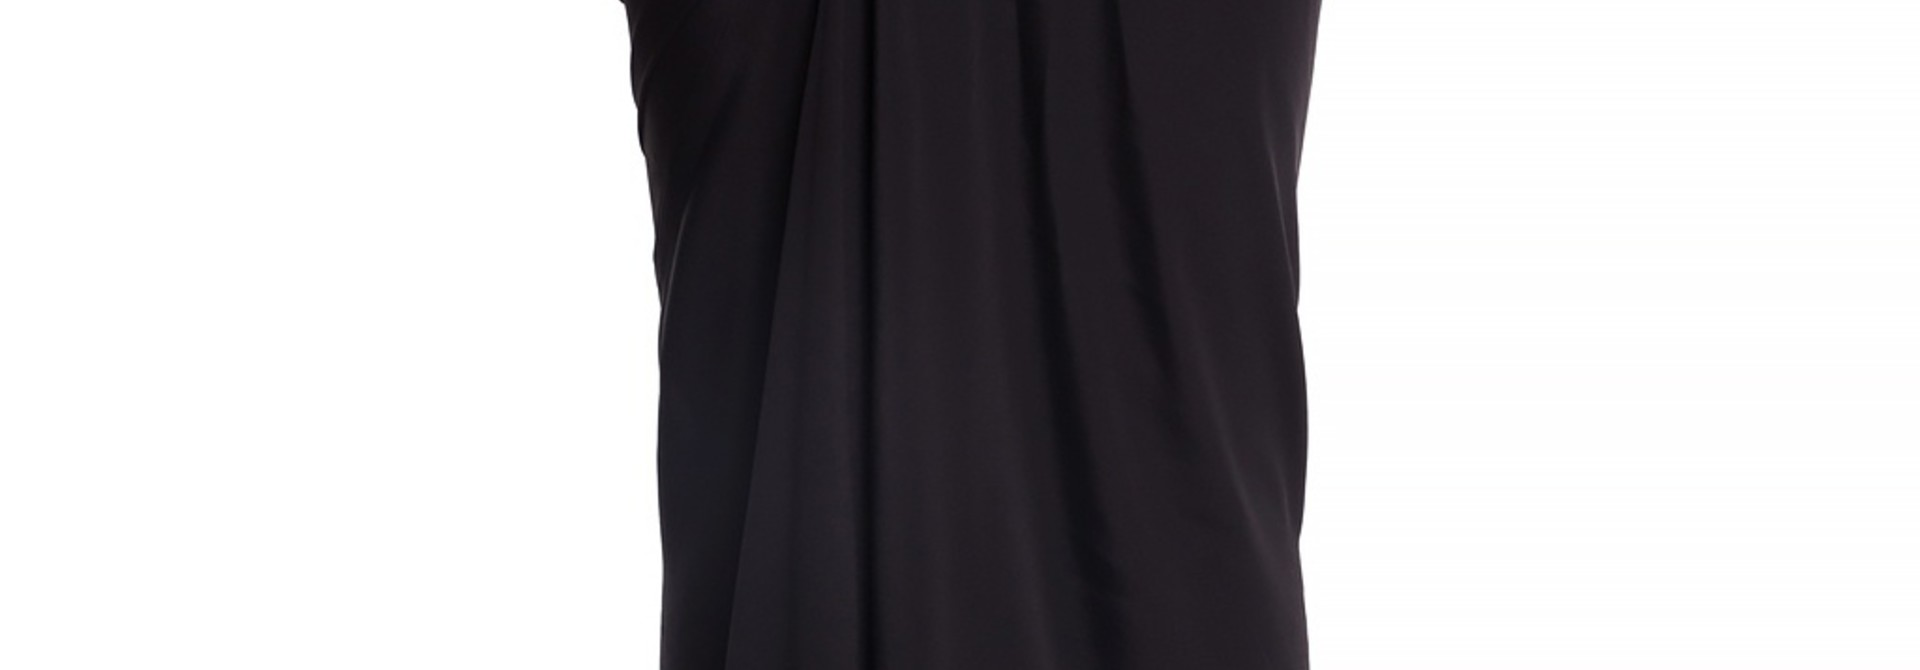 Skirt - Ruched - Black - Sz 40